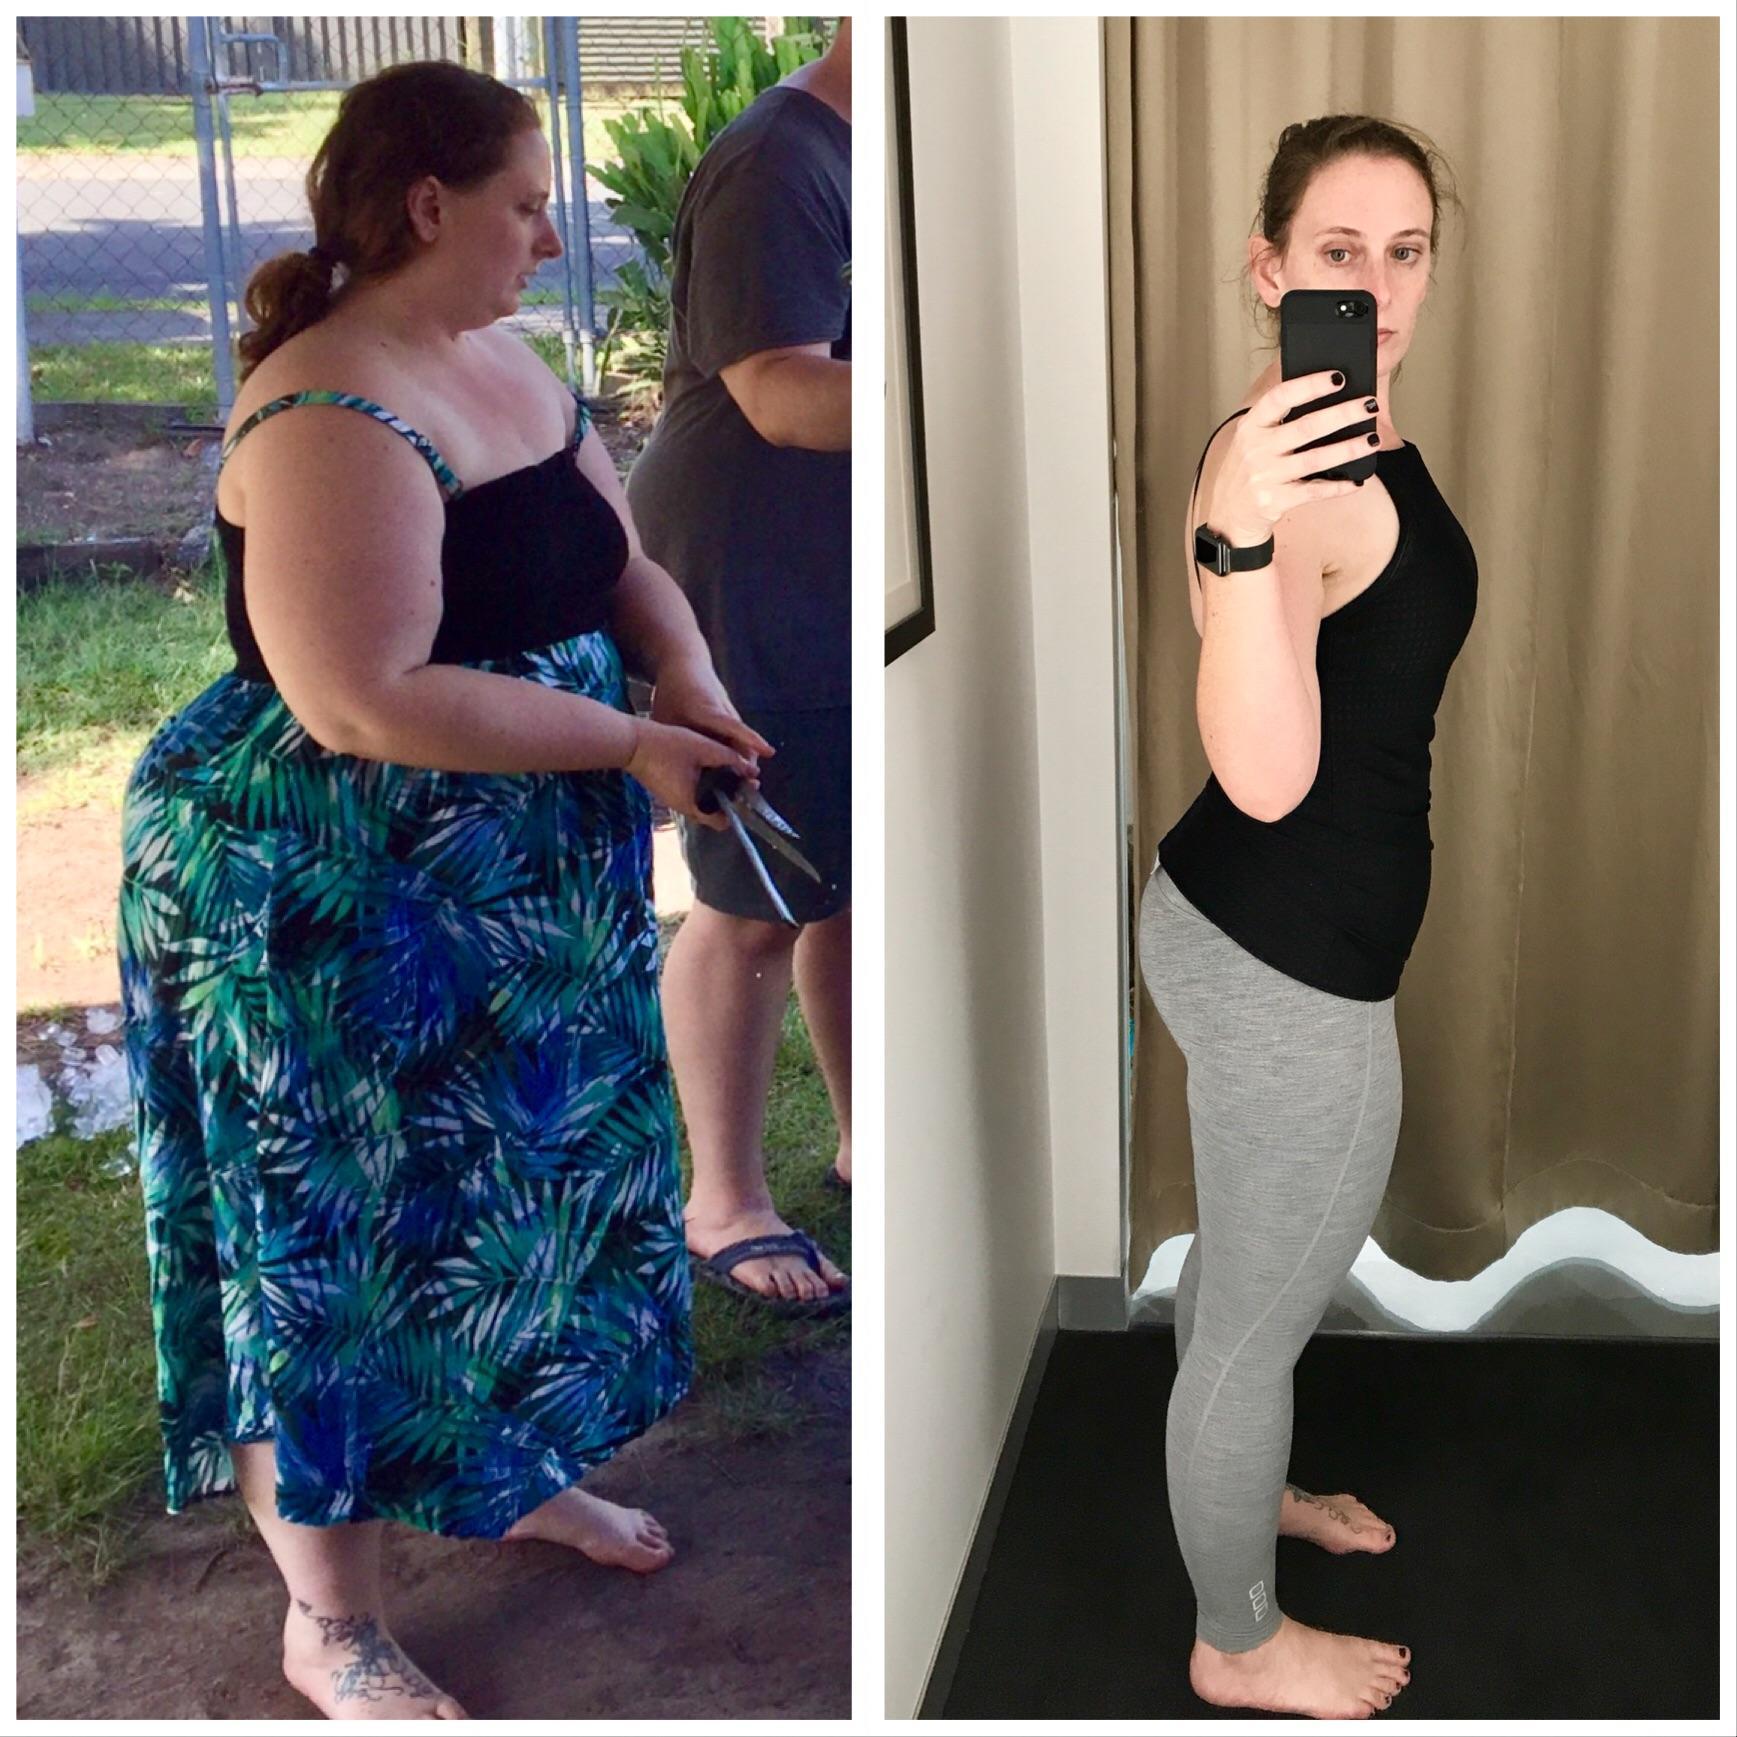 Progress Pics of 155 lbs Weight Loss 5 feet 9 Female 320 lbs to 165 lbs